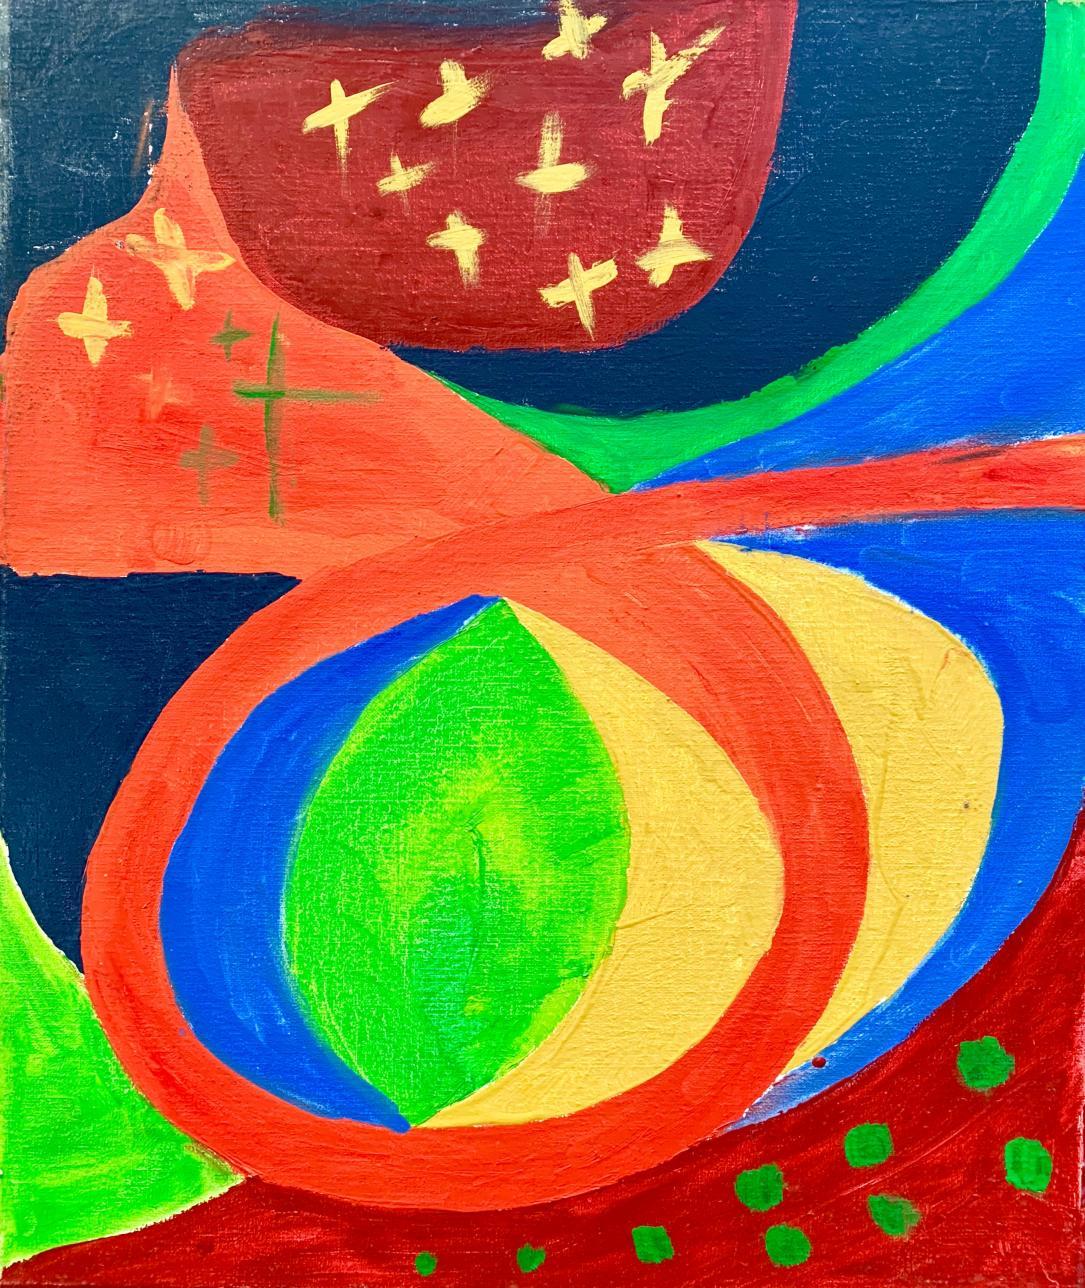 Untitled, 6 series (2009) - Lou Jimenez